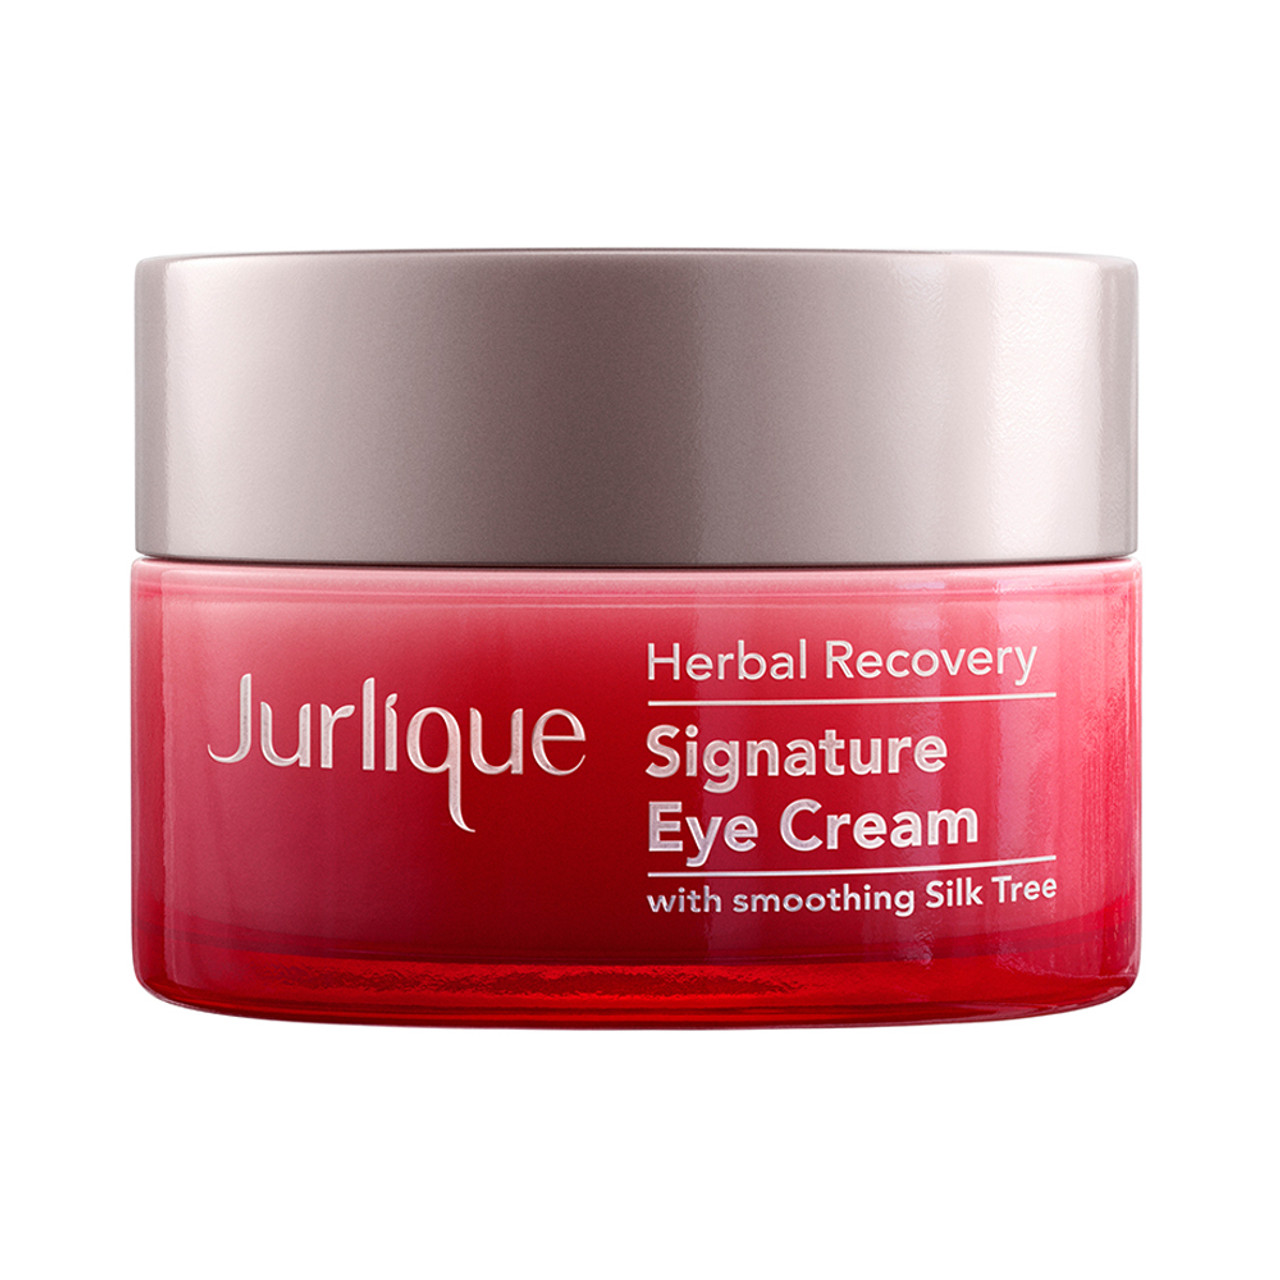 Jurlique Herbal Recovery Signature Eye Cream